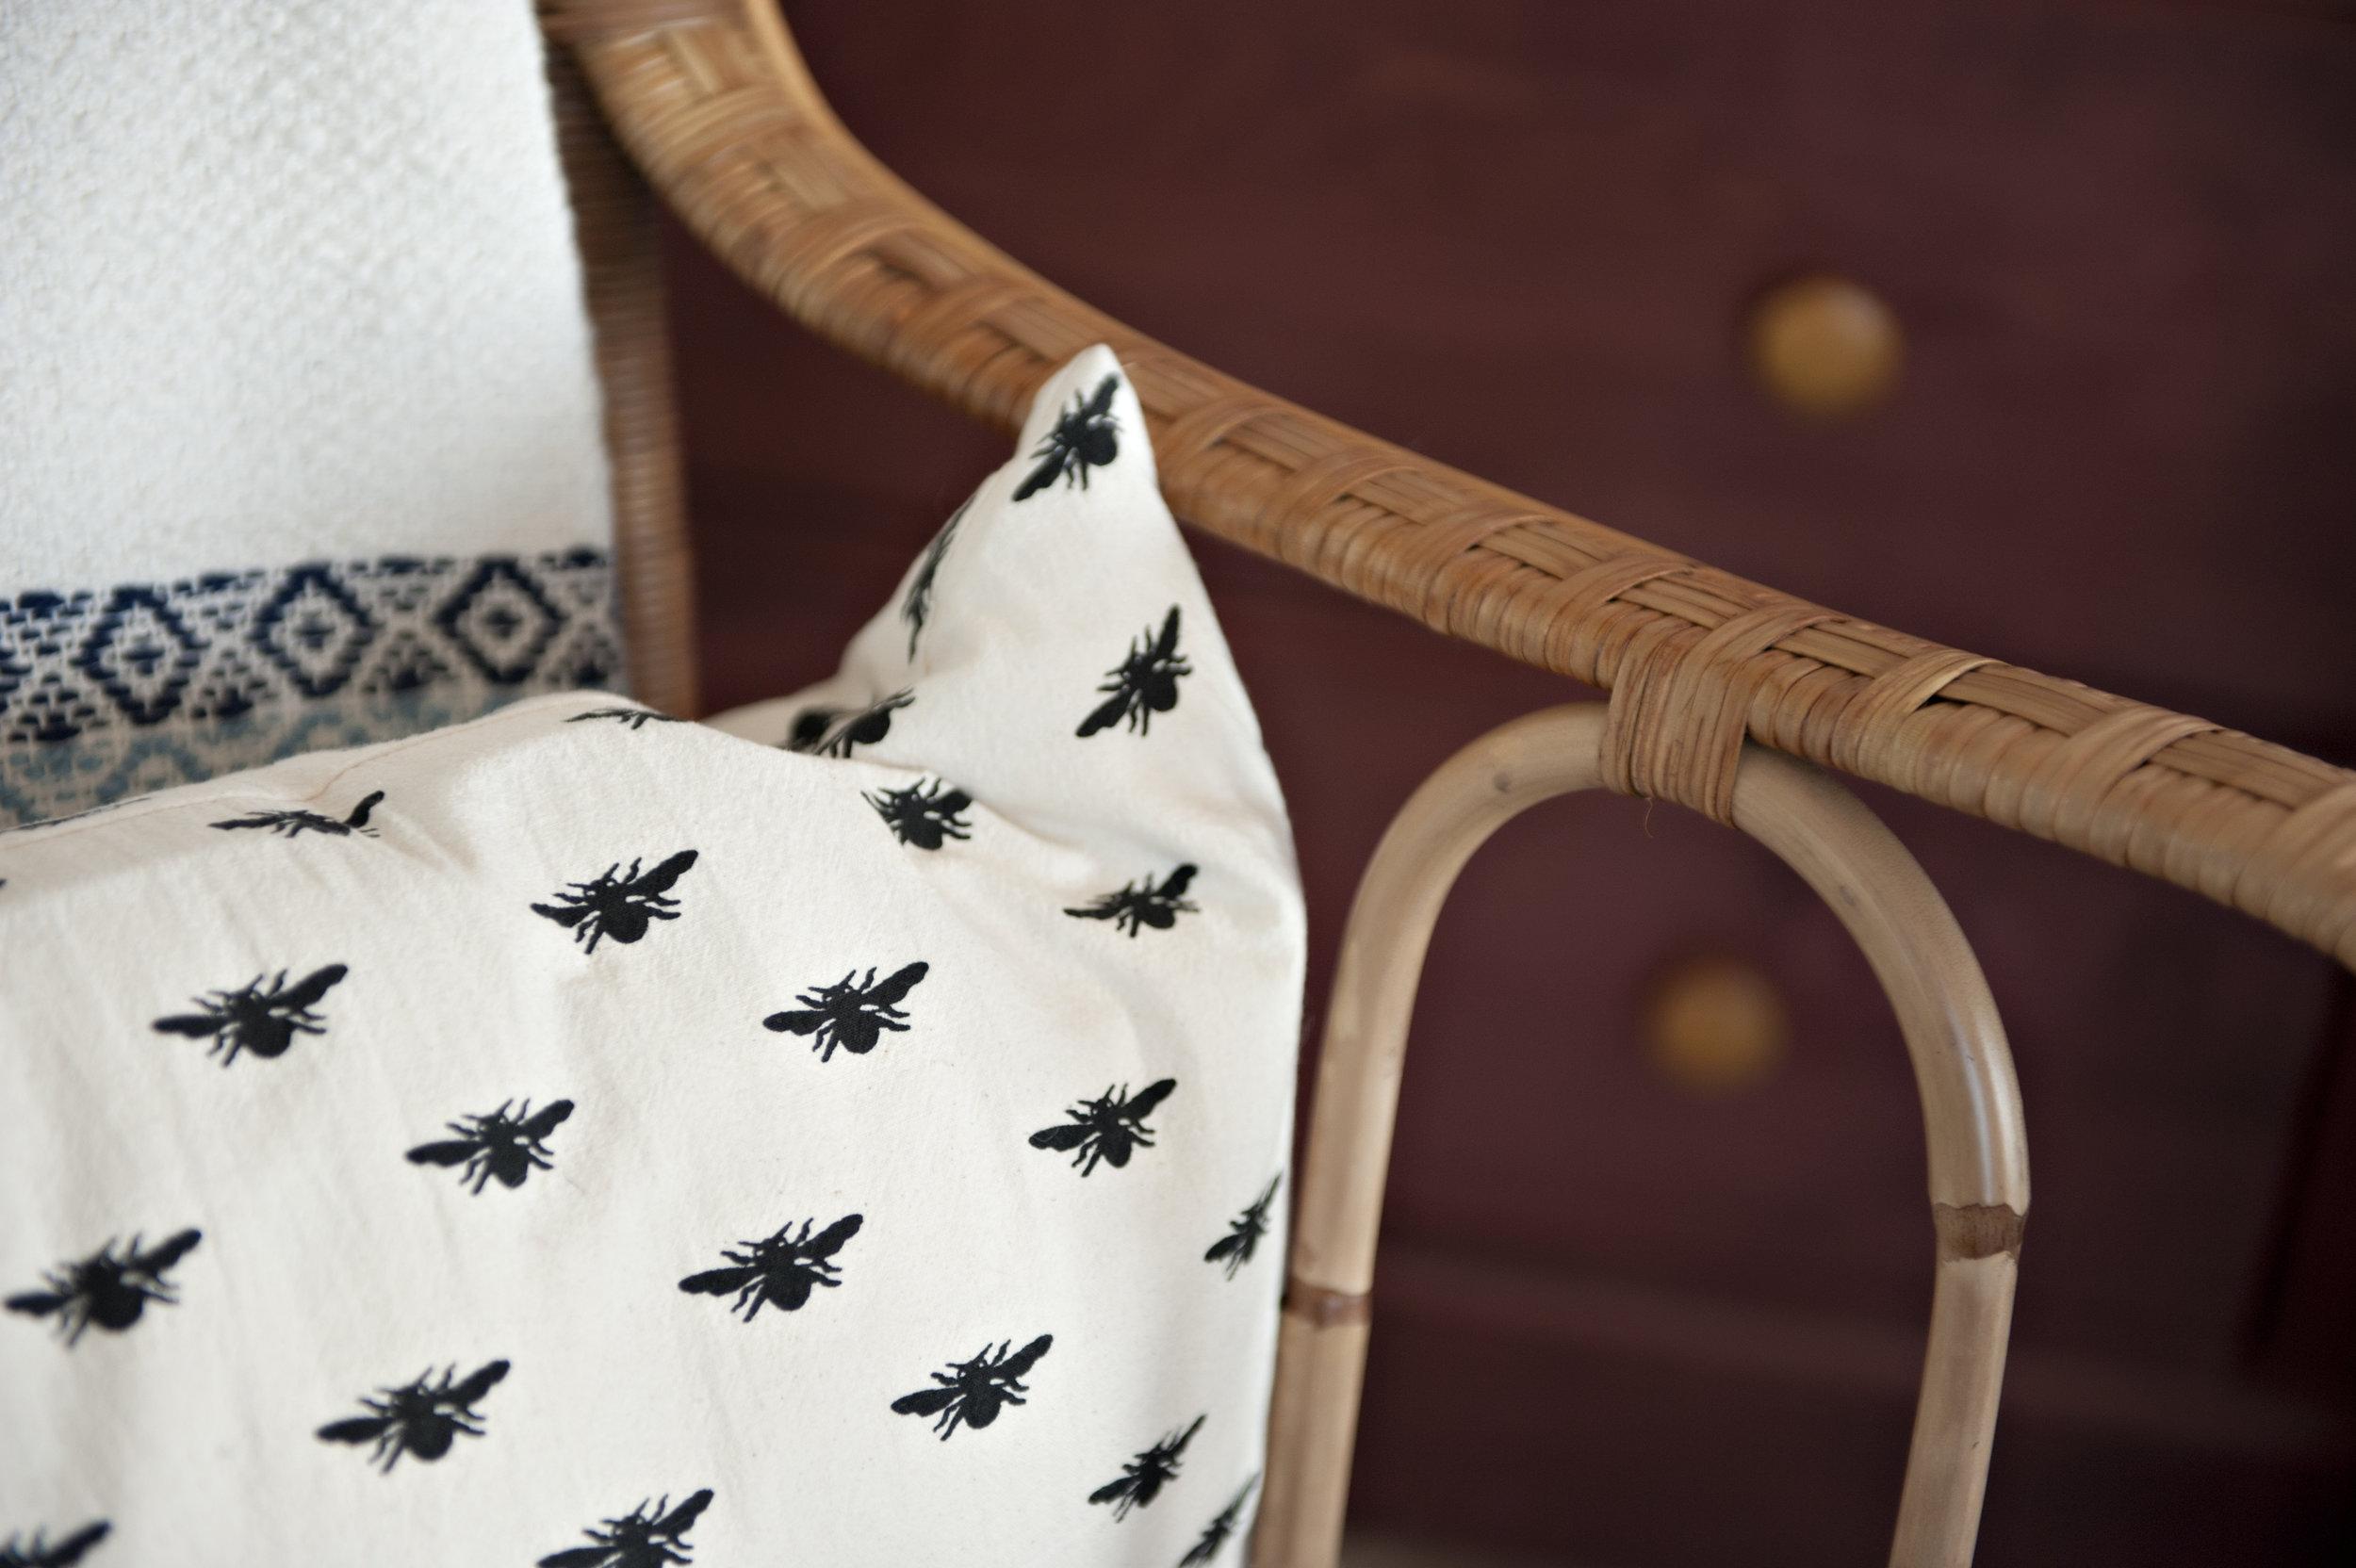 Candace-Plotz-Design-Irving-Wicker-Chair